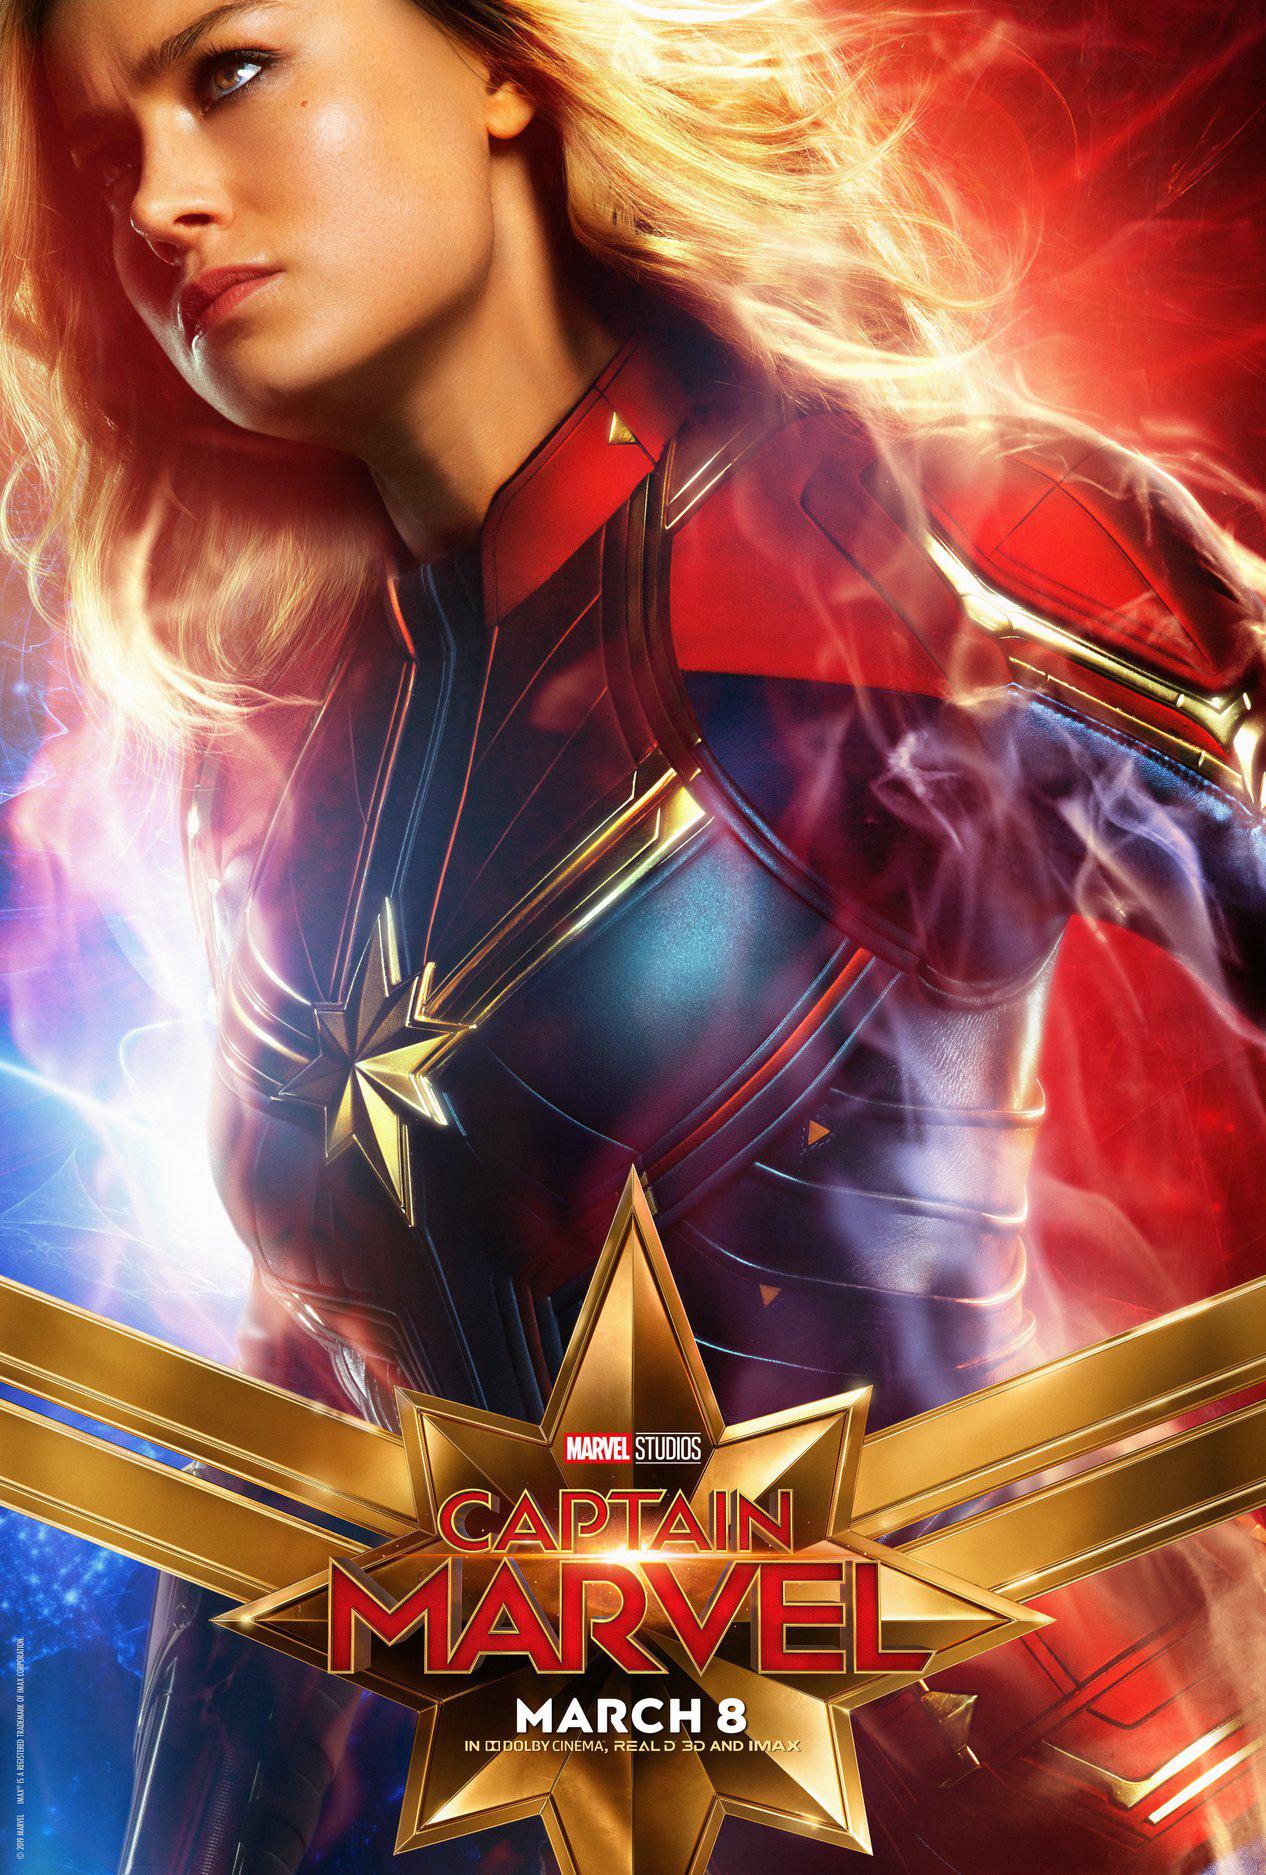 General 1266x1875 Captain Marvel Carol Danvers Marvel Cinematic Universe Marvel Comics Brie Larson blonde women superheroines 2019 (Year) movies